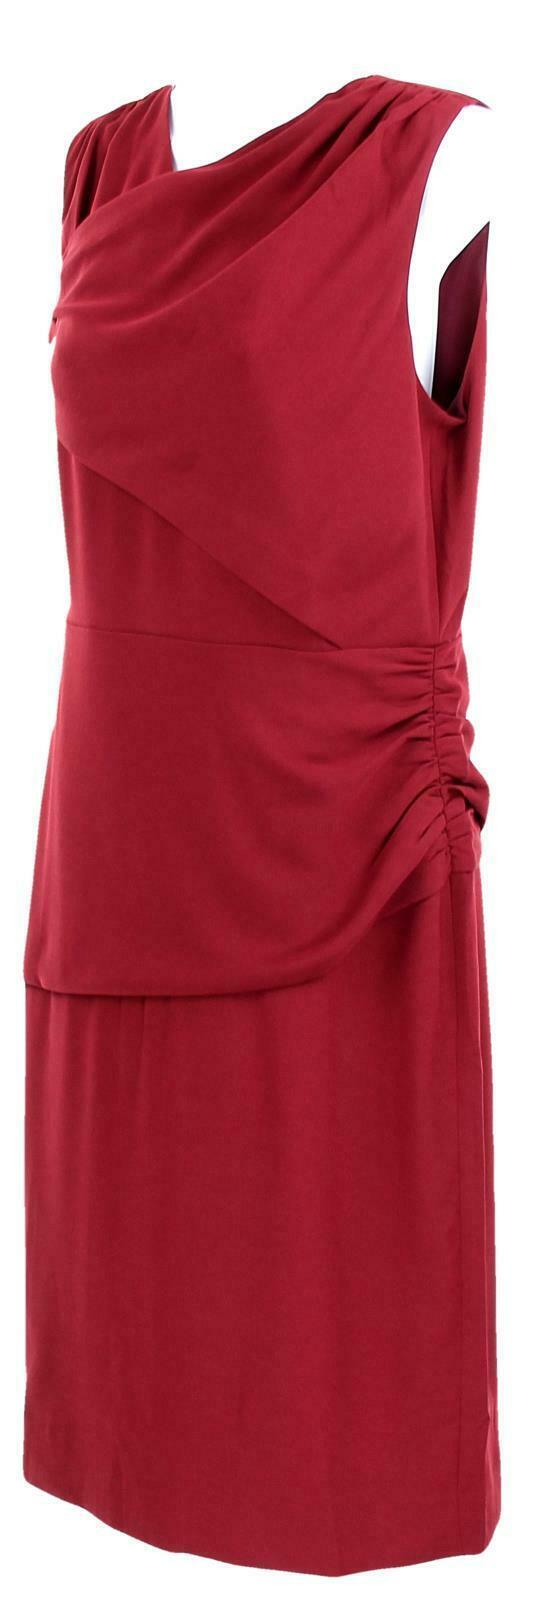 J Crew Women's High Neck Sheath Dress Everyday Lucky Crepe Wear to Work 8 J7452 image 3